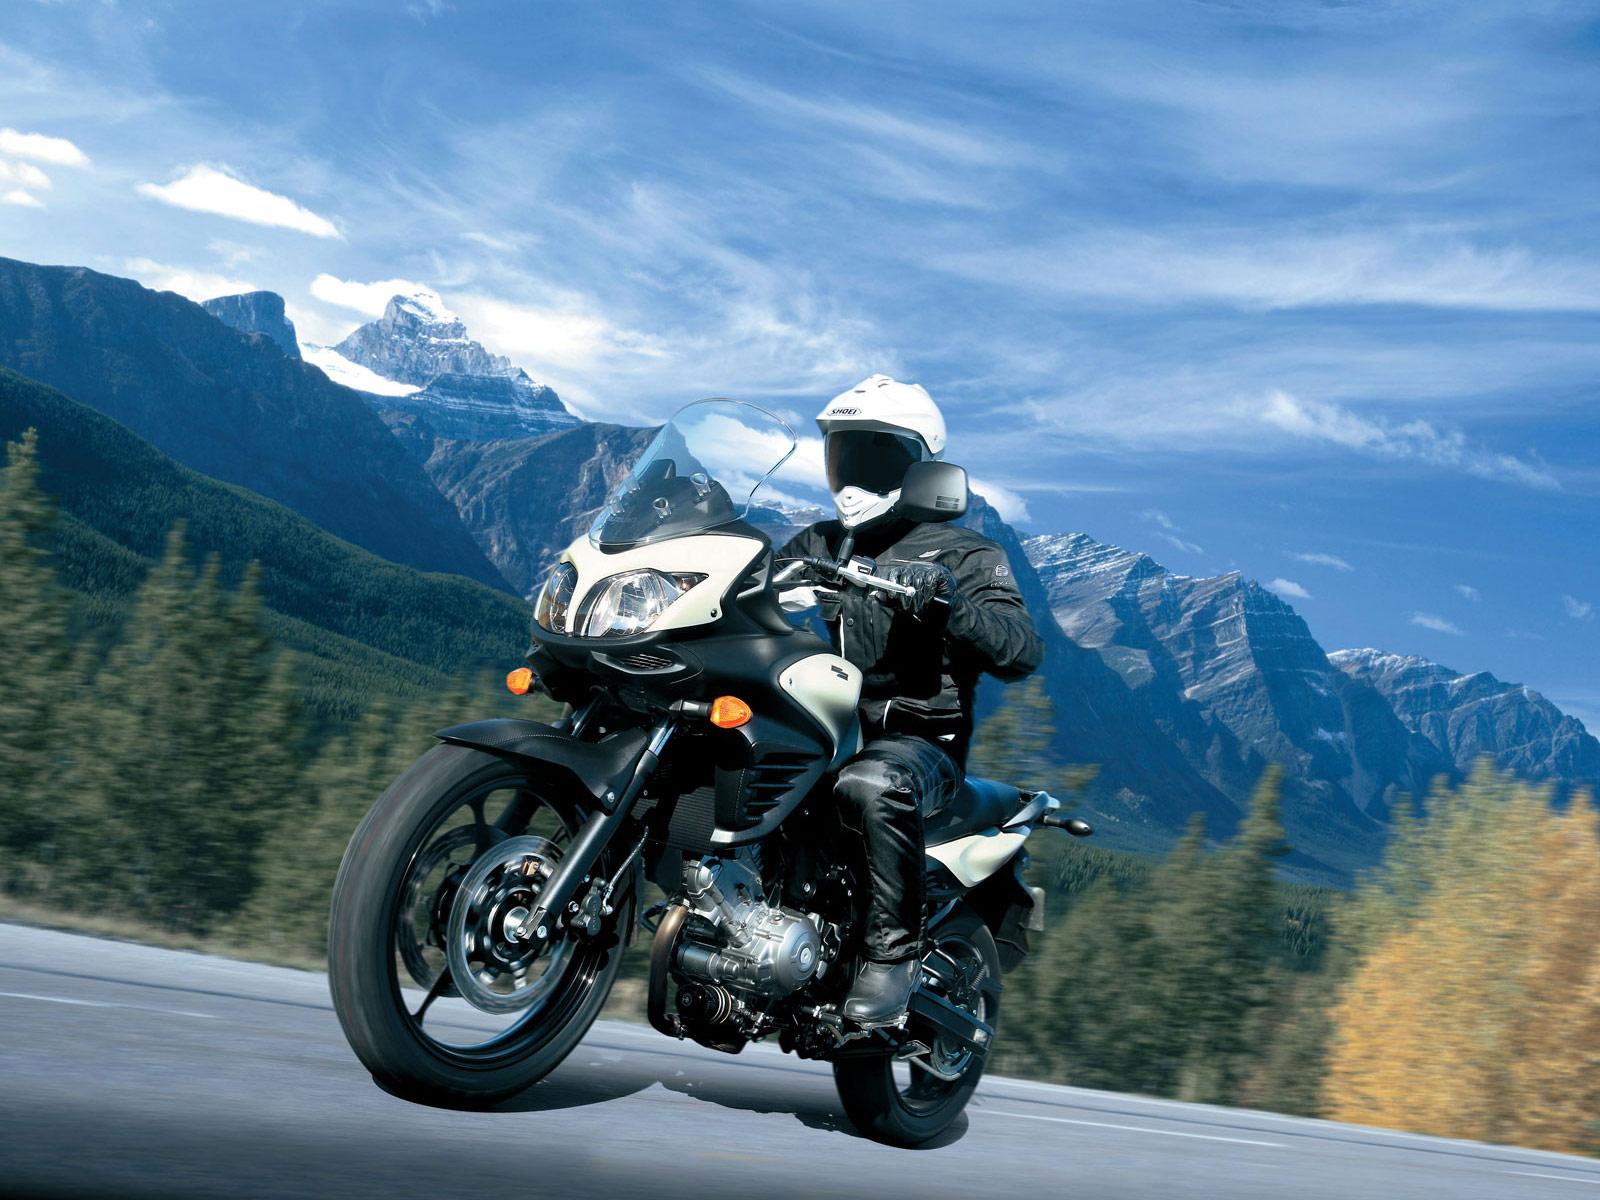 http://2.bp.blogspot.com/-0V0xTMRNC38/Tpz7eEDhuYI/AAAAAAAACdc/si620CDPNiA/s1600/2012-Suzuki-VStrom-650-ABS_motorcycle-desktop-wallpaper_1.jpg